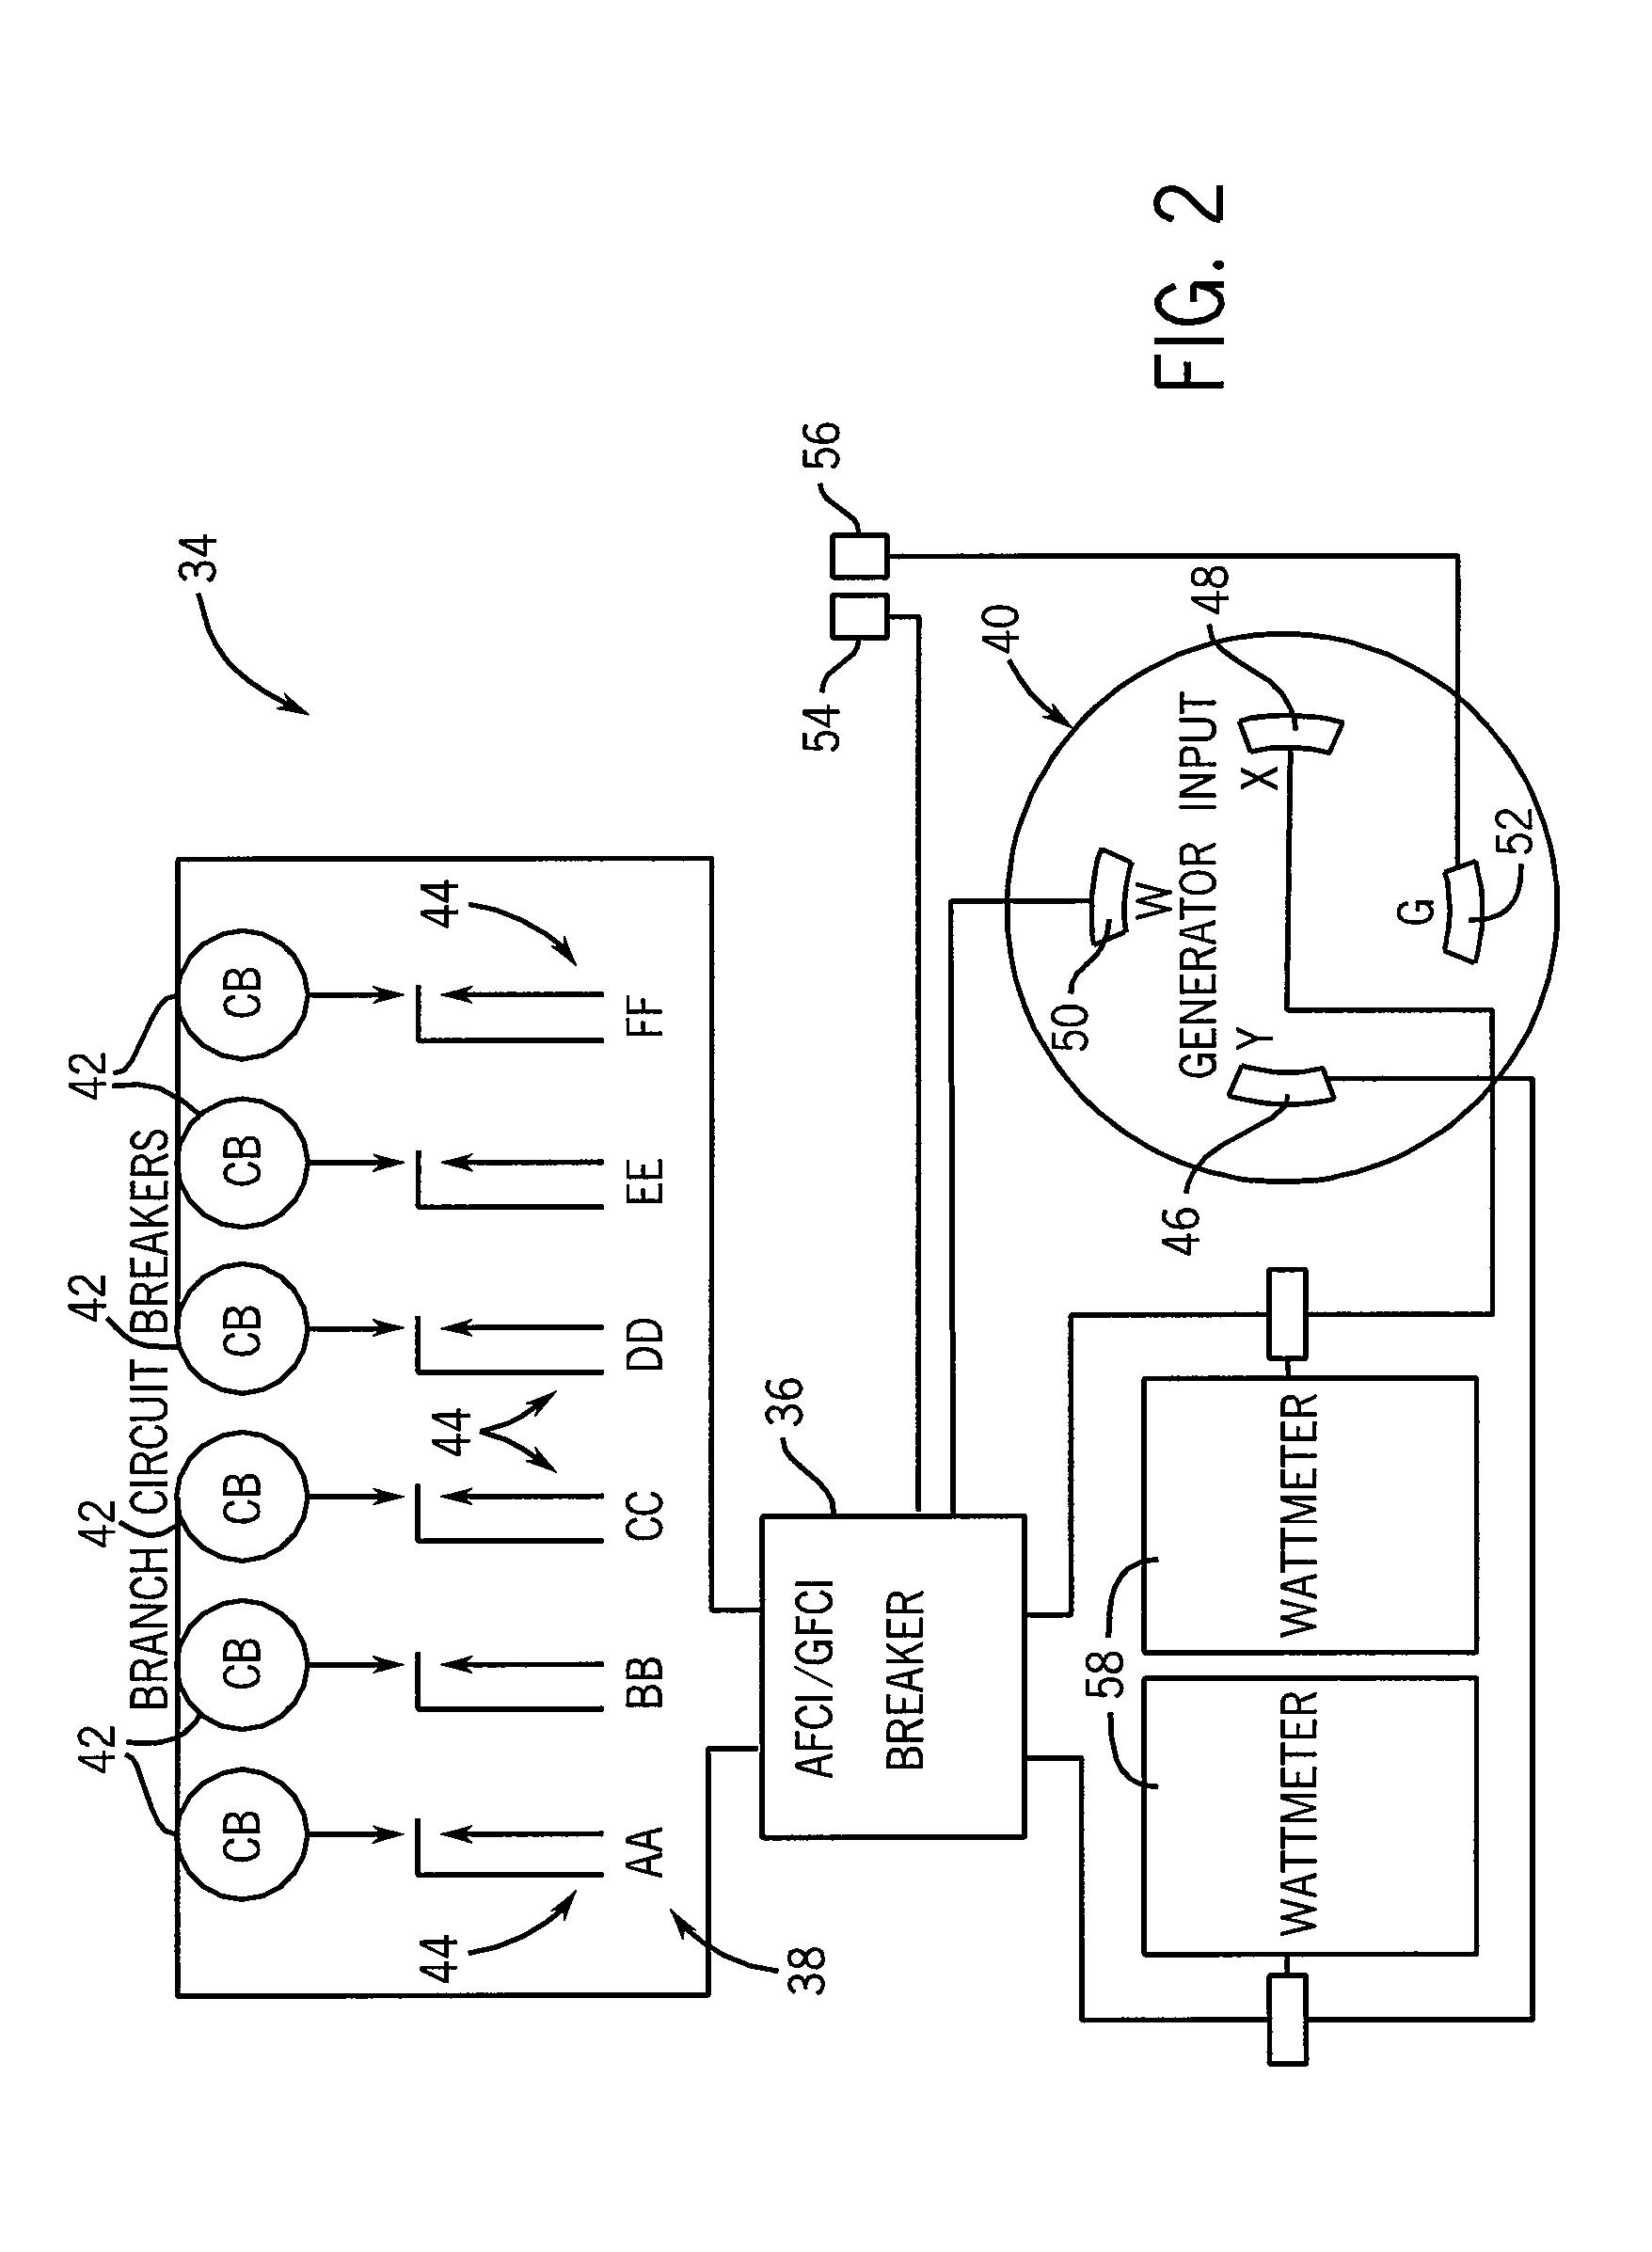 fault circuit interrupt gfci circuit breaker branch circuit and